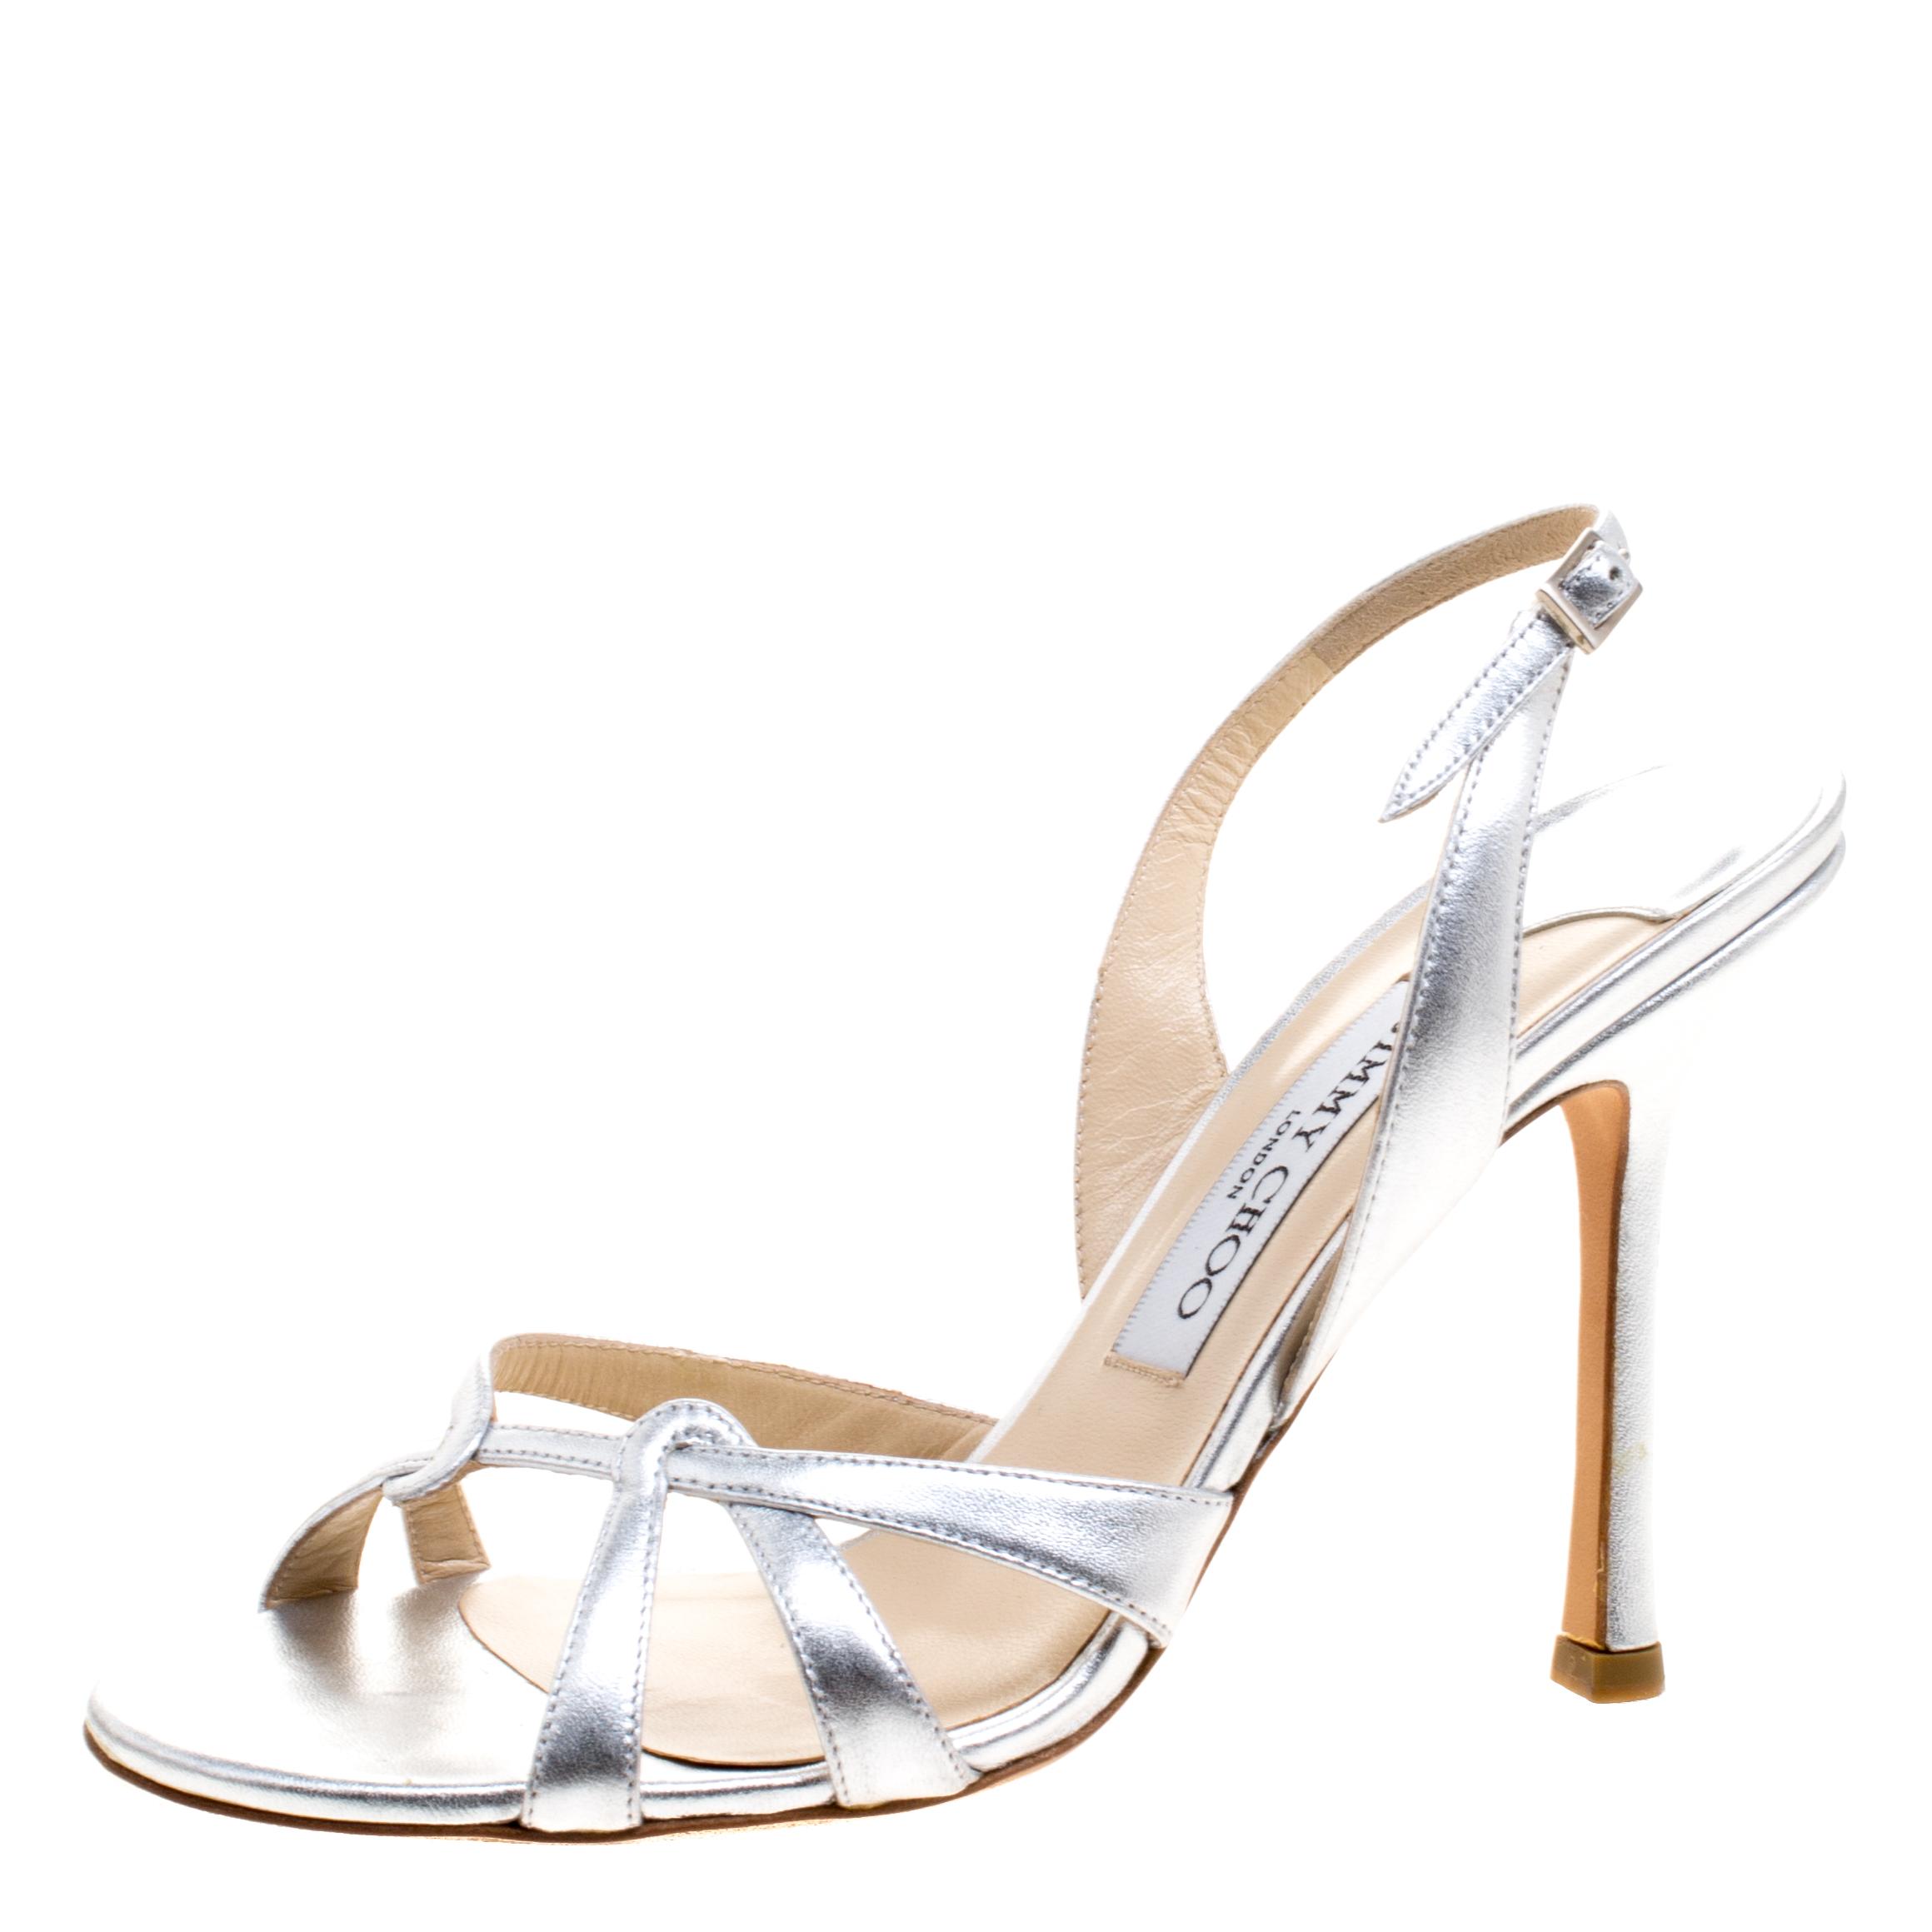 2628d15cba266 Jimmy Choo Metallic Silver Leather Slingback Open Toe Sandals Size 38